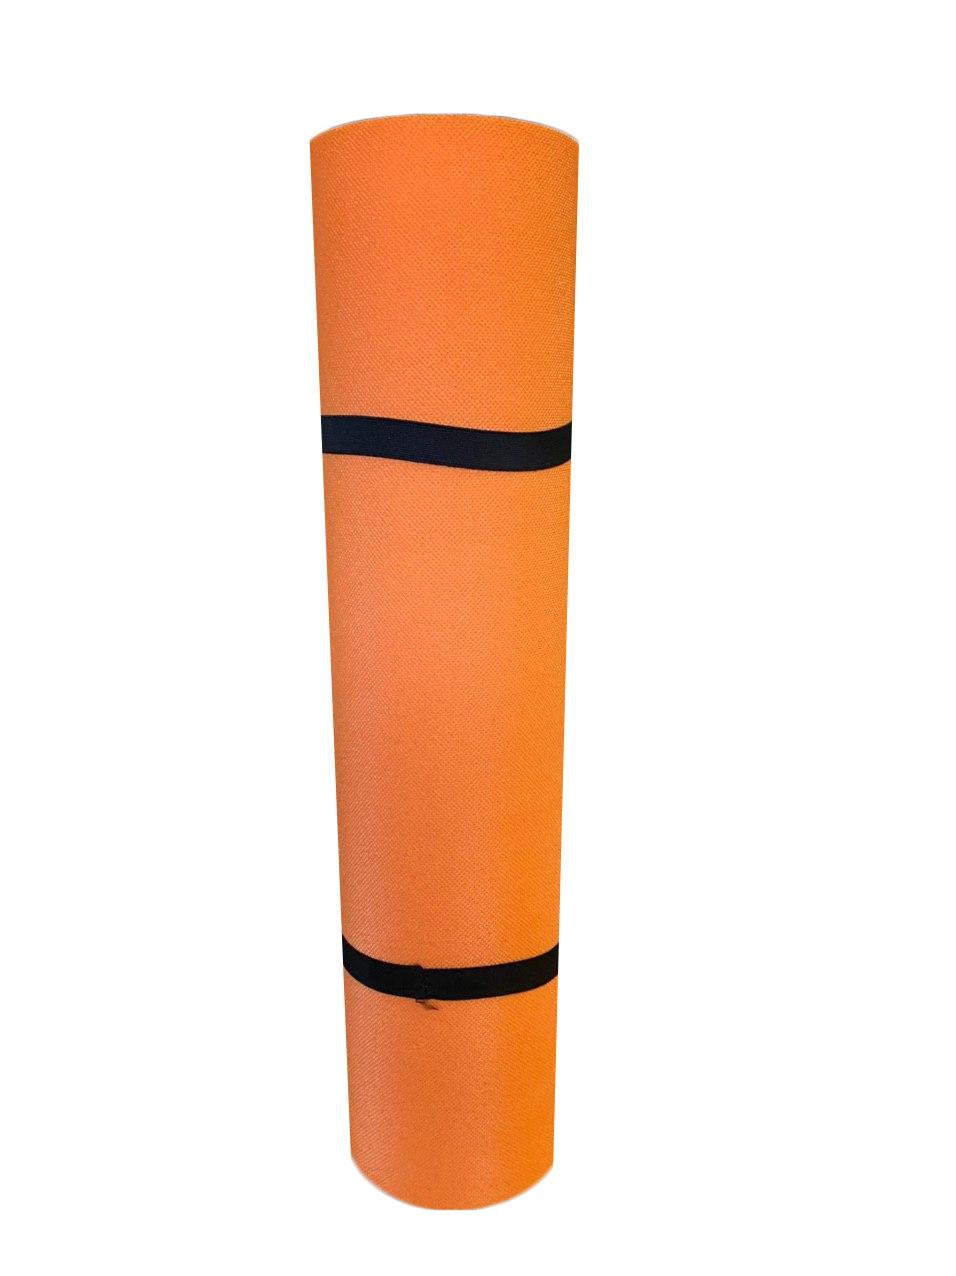 Коврик для фитнеса оранжевый, т. 5 мм, размер 50х150 см, производитель Украина, TERMOIZOL®